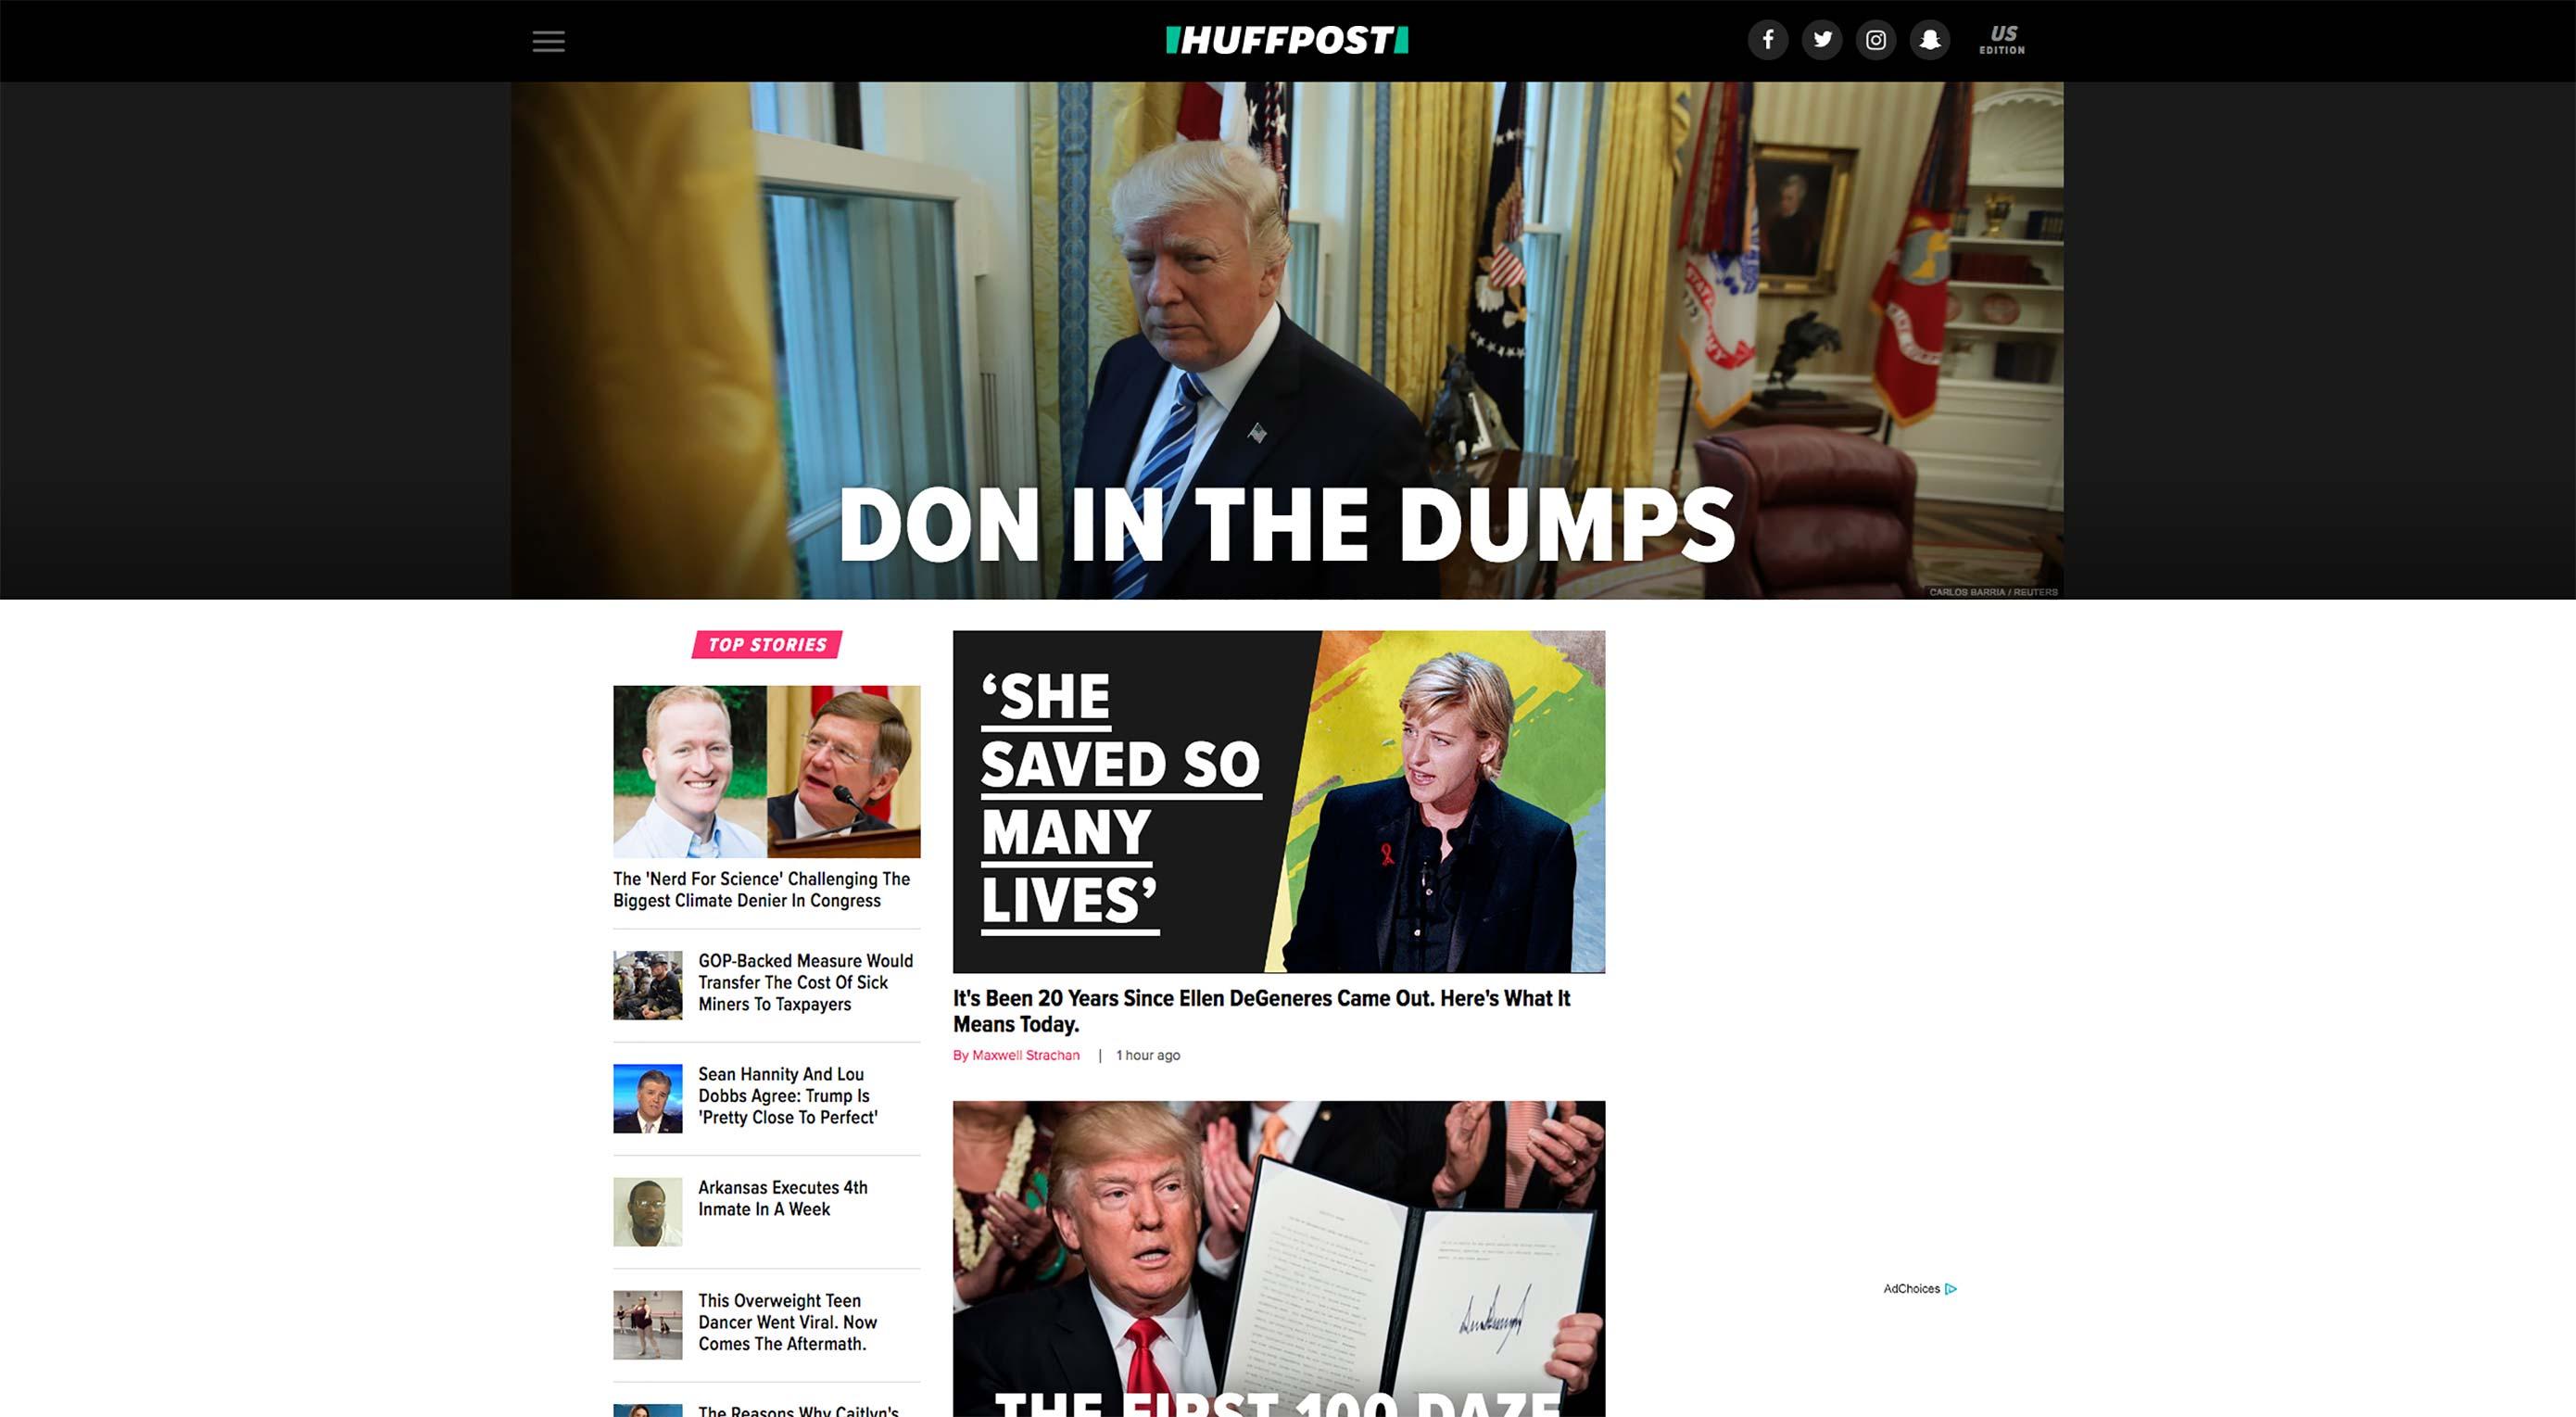 Huffpost Unveils New Design